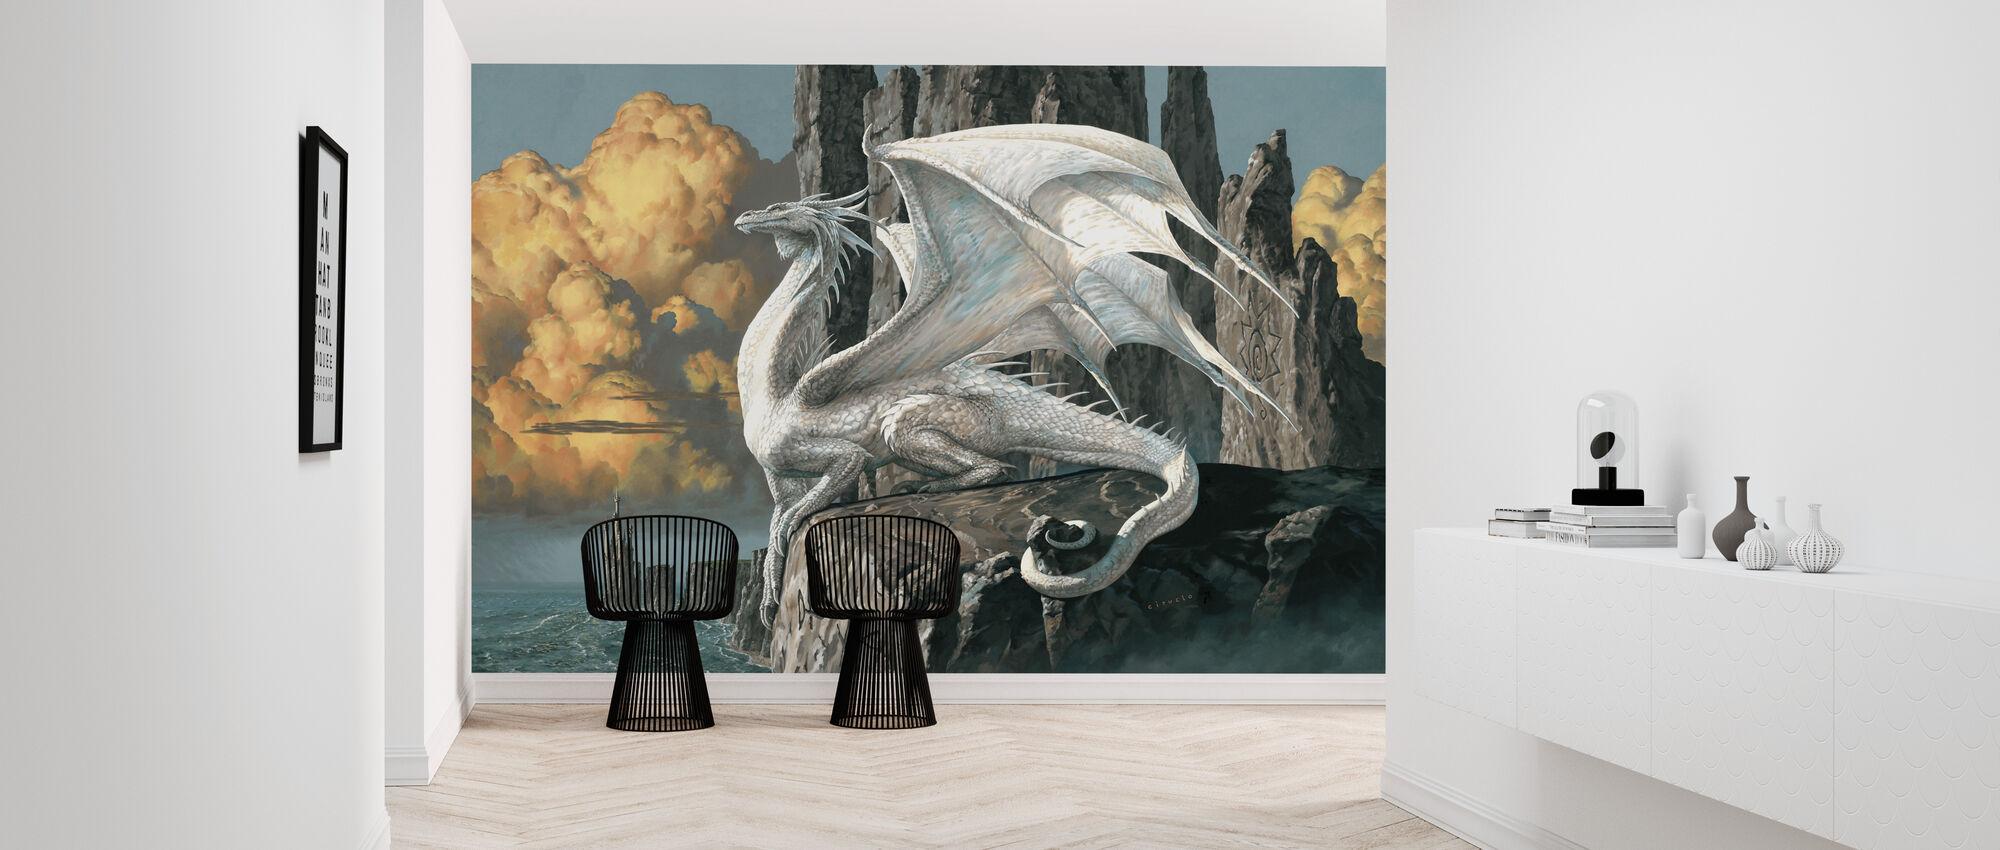 Hobsyllwin - Wallpaper - Hallway